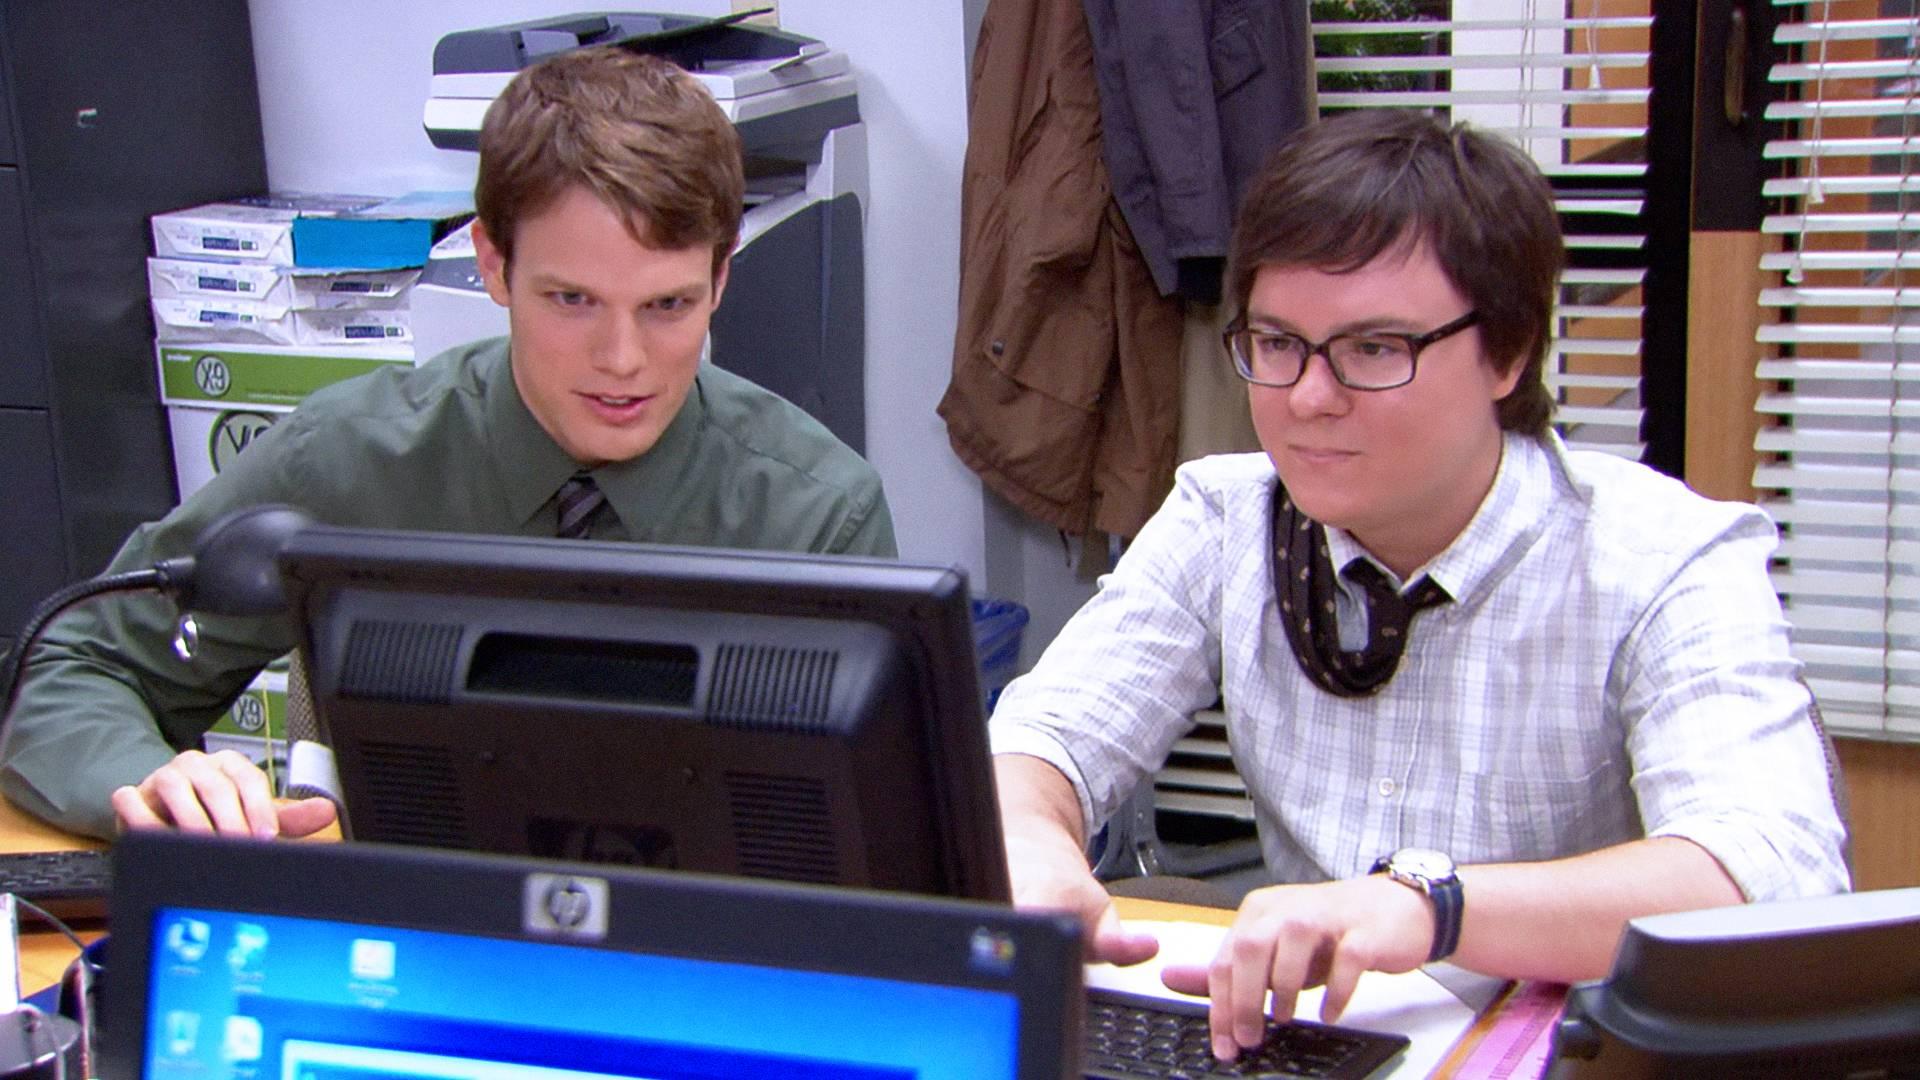 The Office Season 9 Episode 1